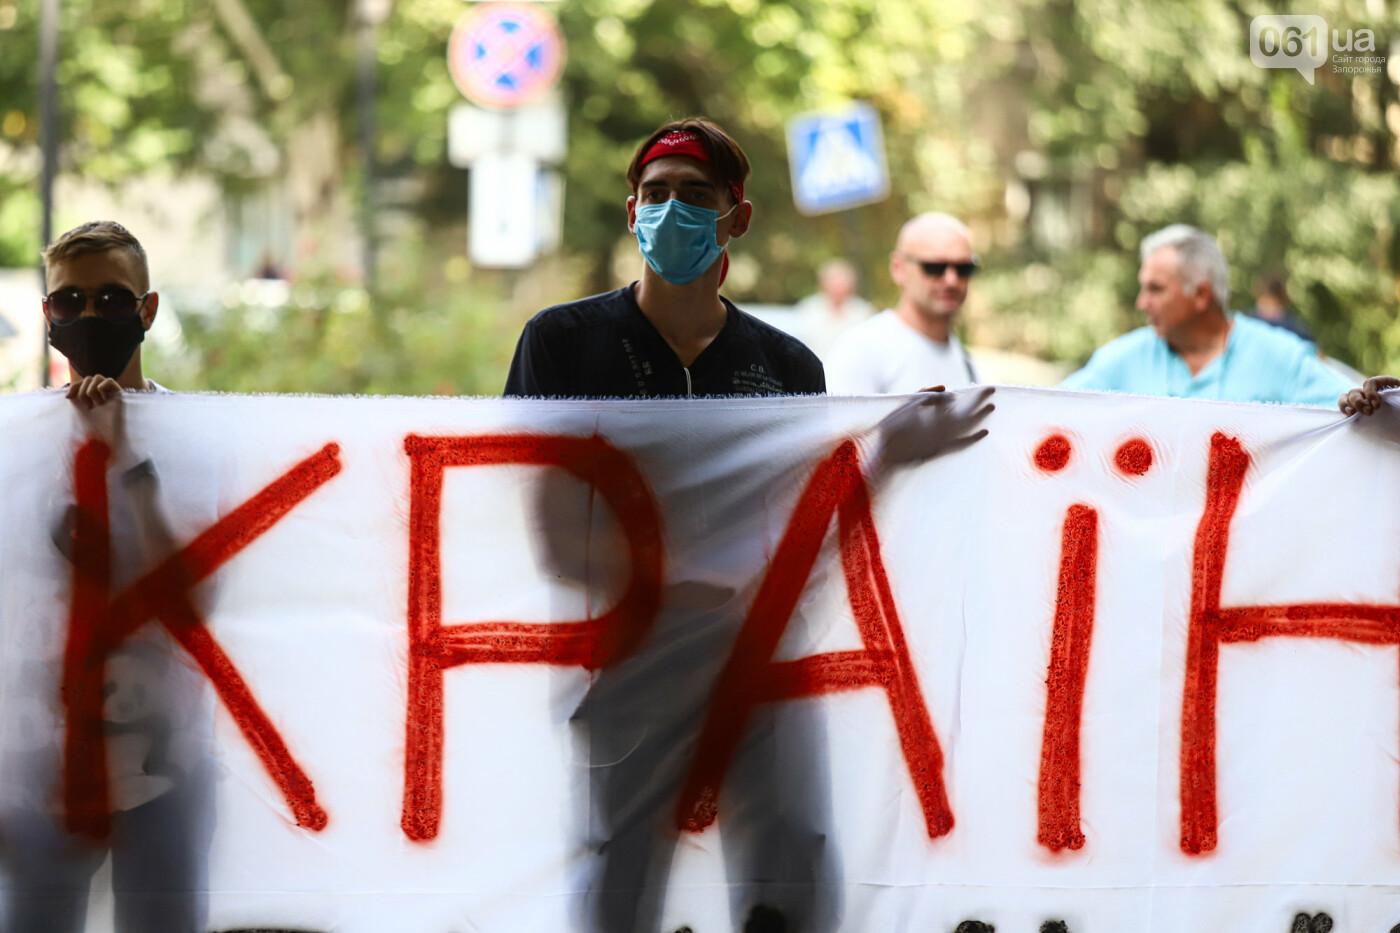 """Захист країни - не злочин"": в Запорожье патриоты провели митинг у стен нацполиции, - ФОТОРЕПОРТАЖ , фото-17"